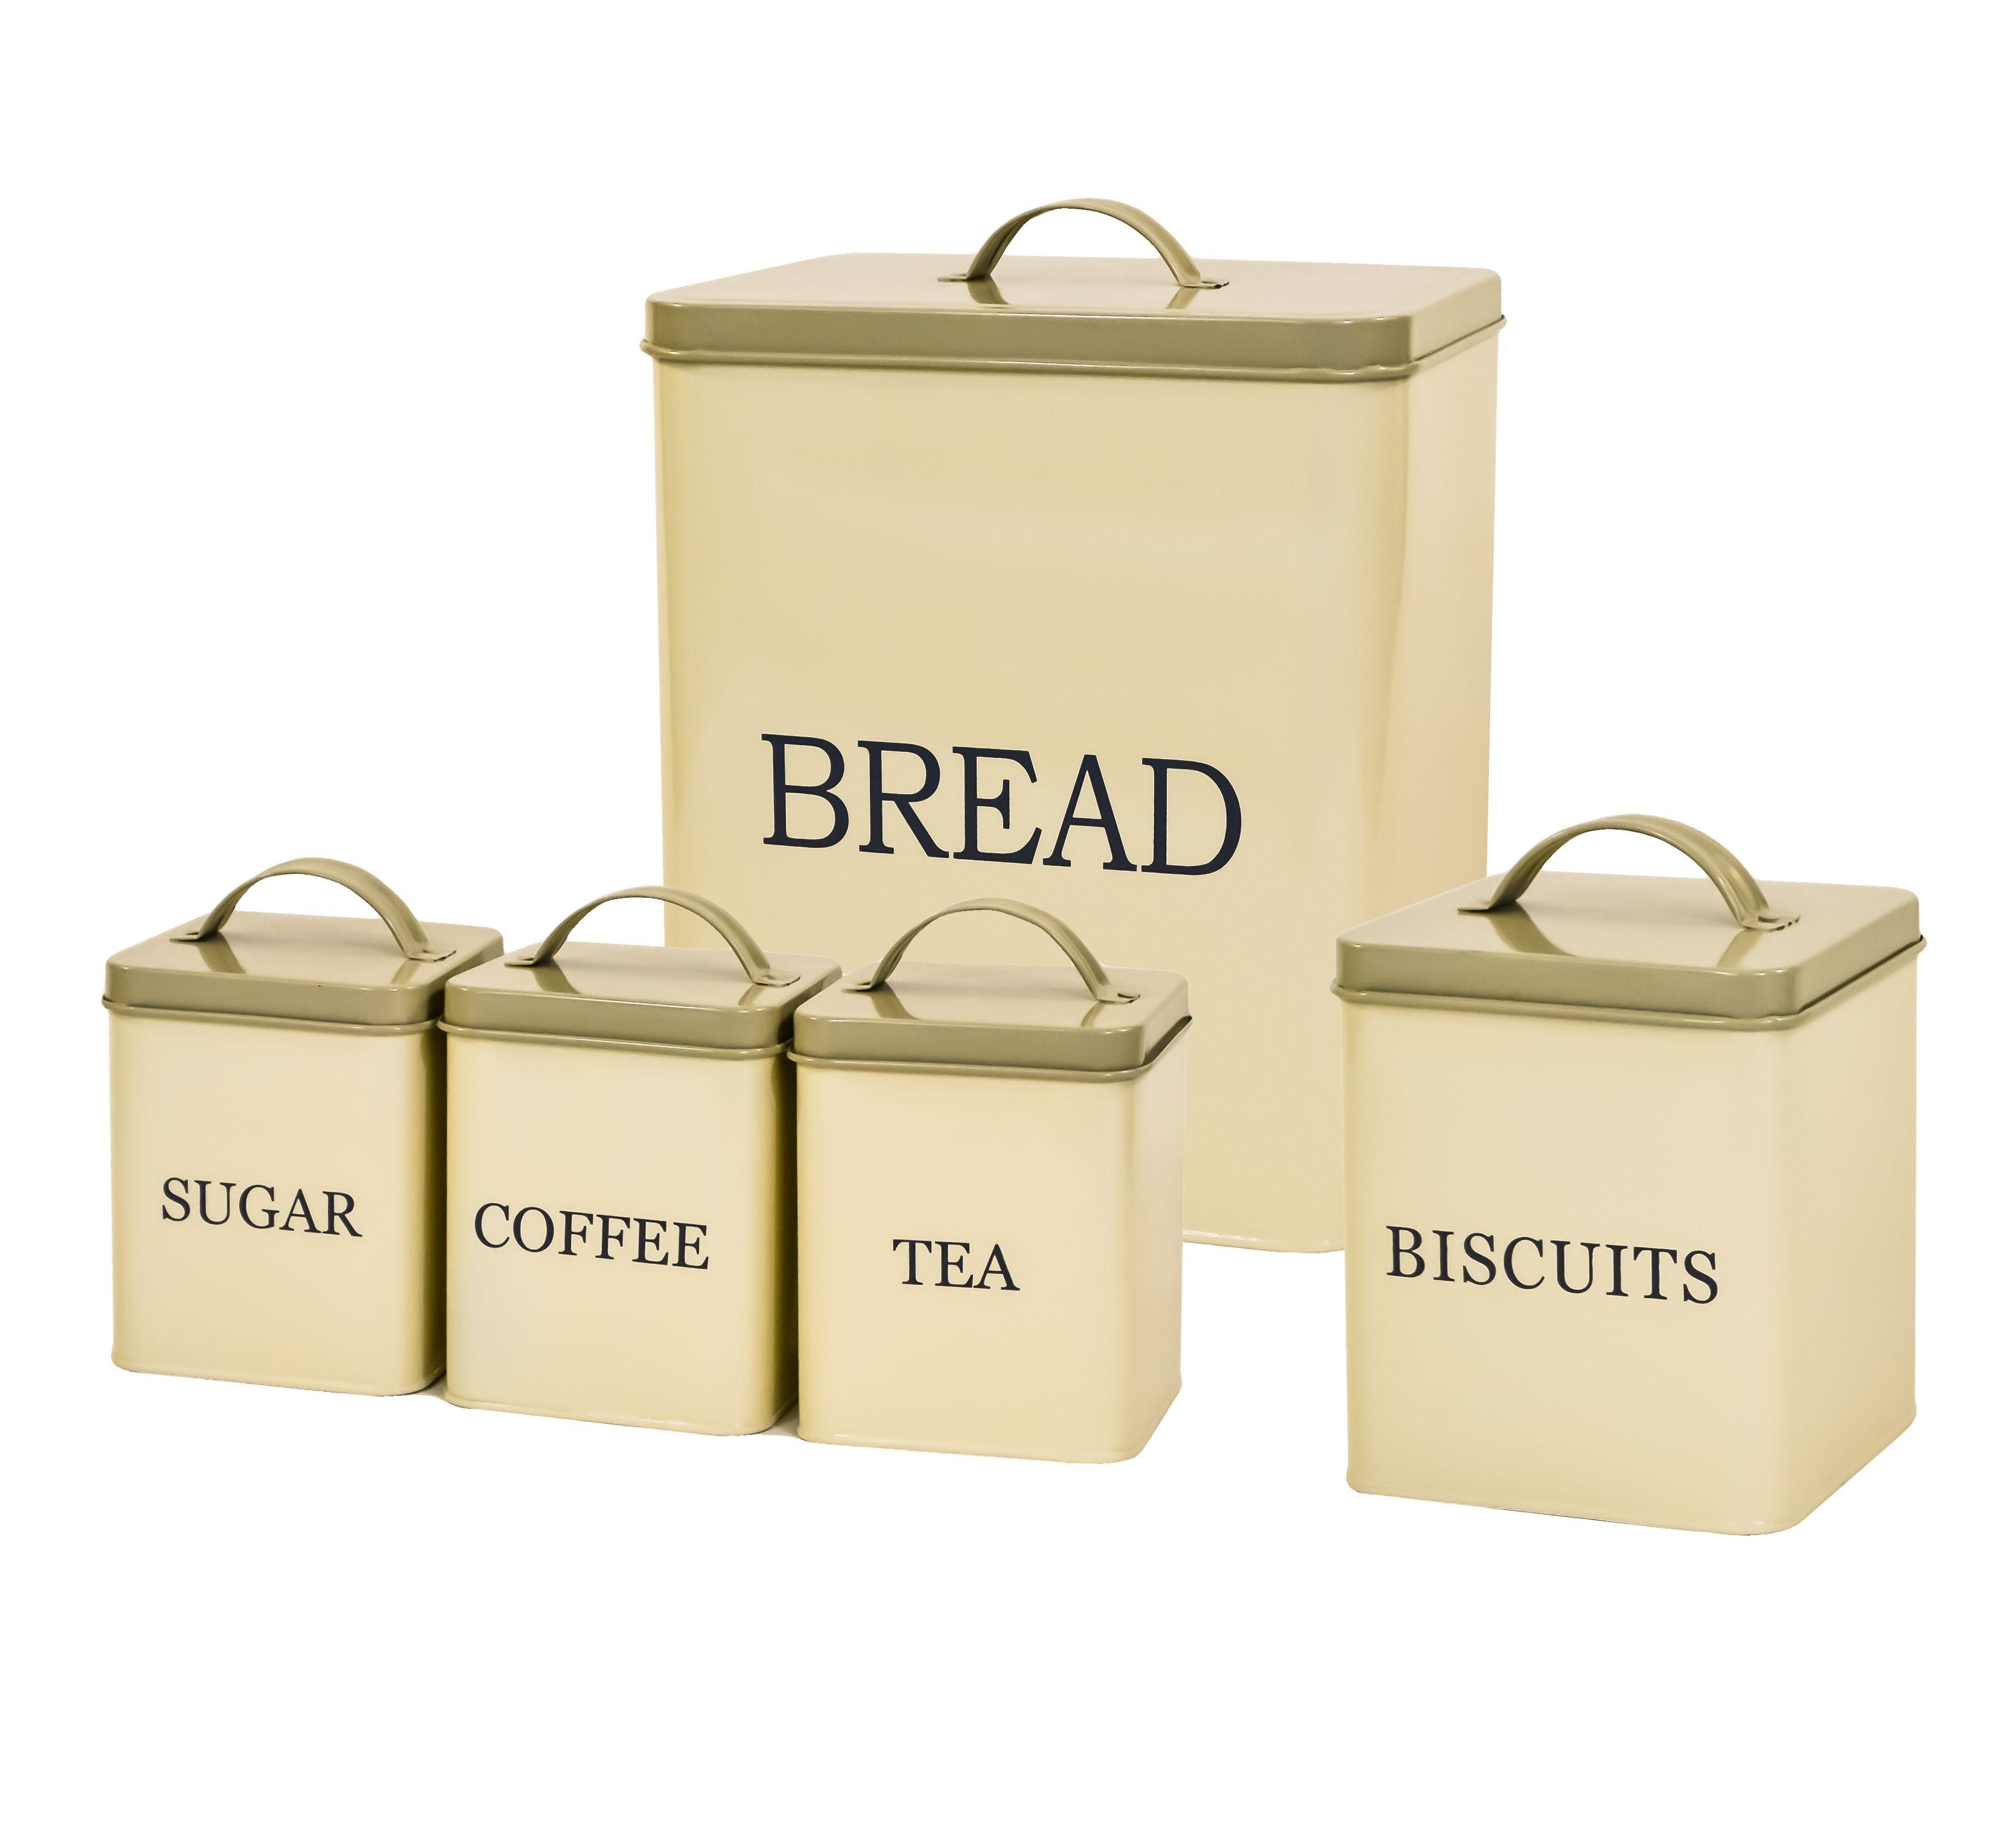 Cream Enamel Bread Bin Box U0026 Tea Coffee Sugar Storage Canister Biscuit Tin  Set In Home, Furniture U0026 DIY, Cookware, Dining U0026 Bar, Food U0026 Kitchen Storage